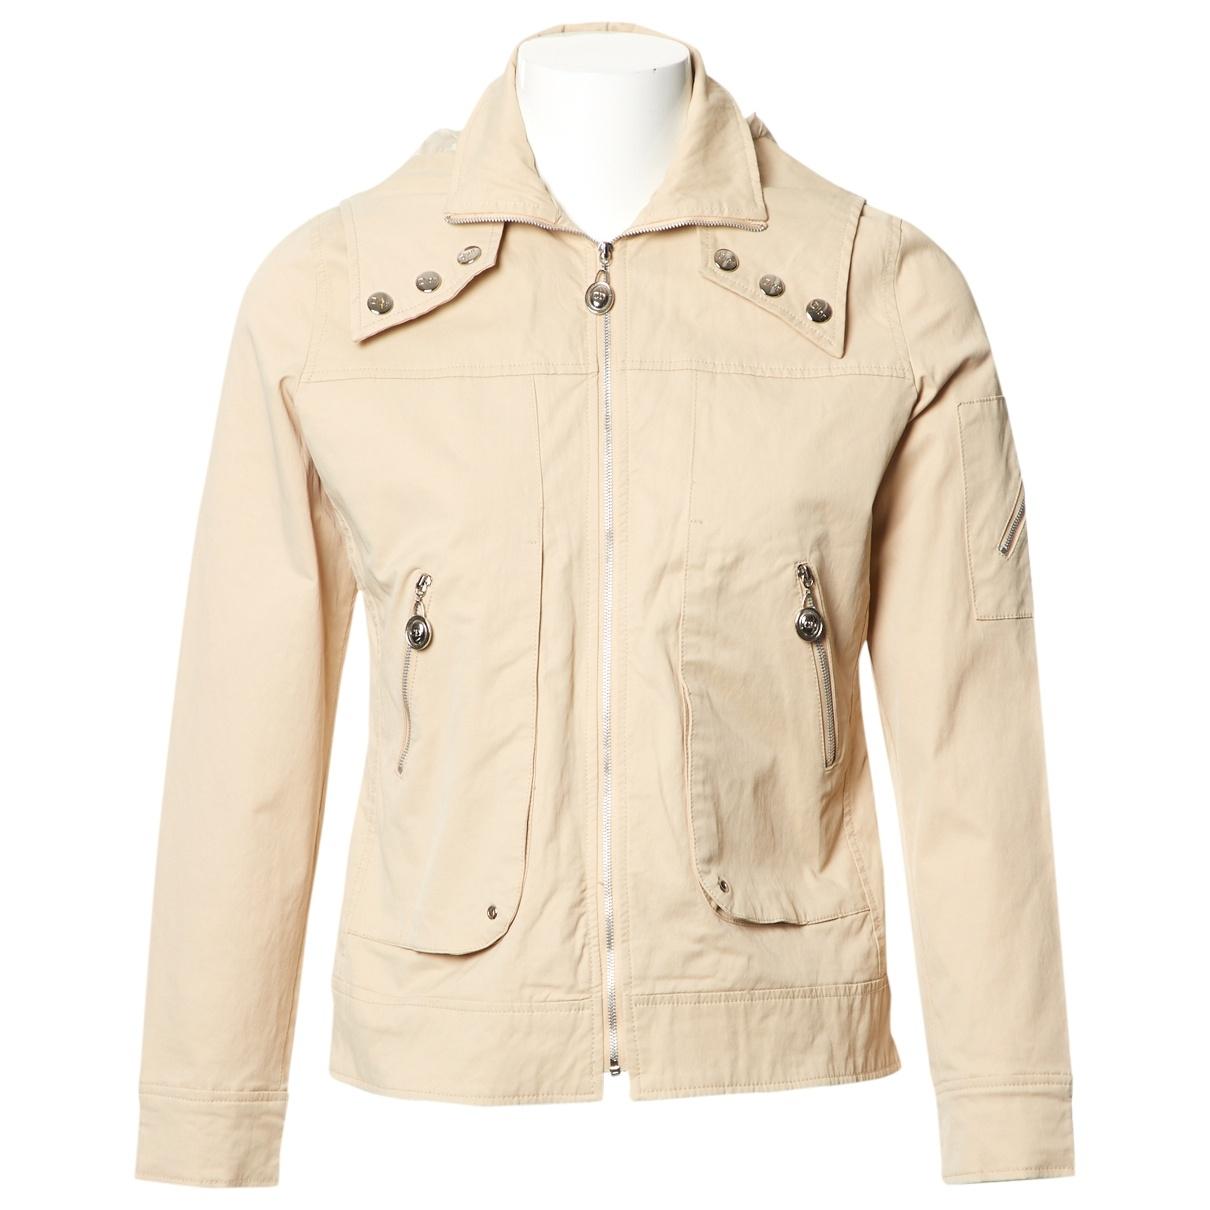 Dior \N Beige jacket for Women M International